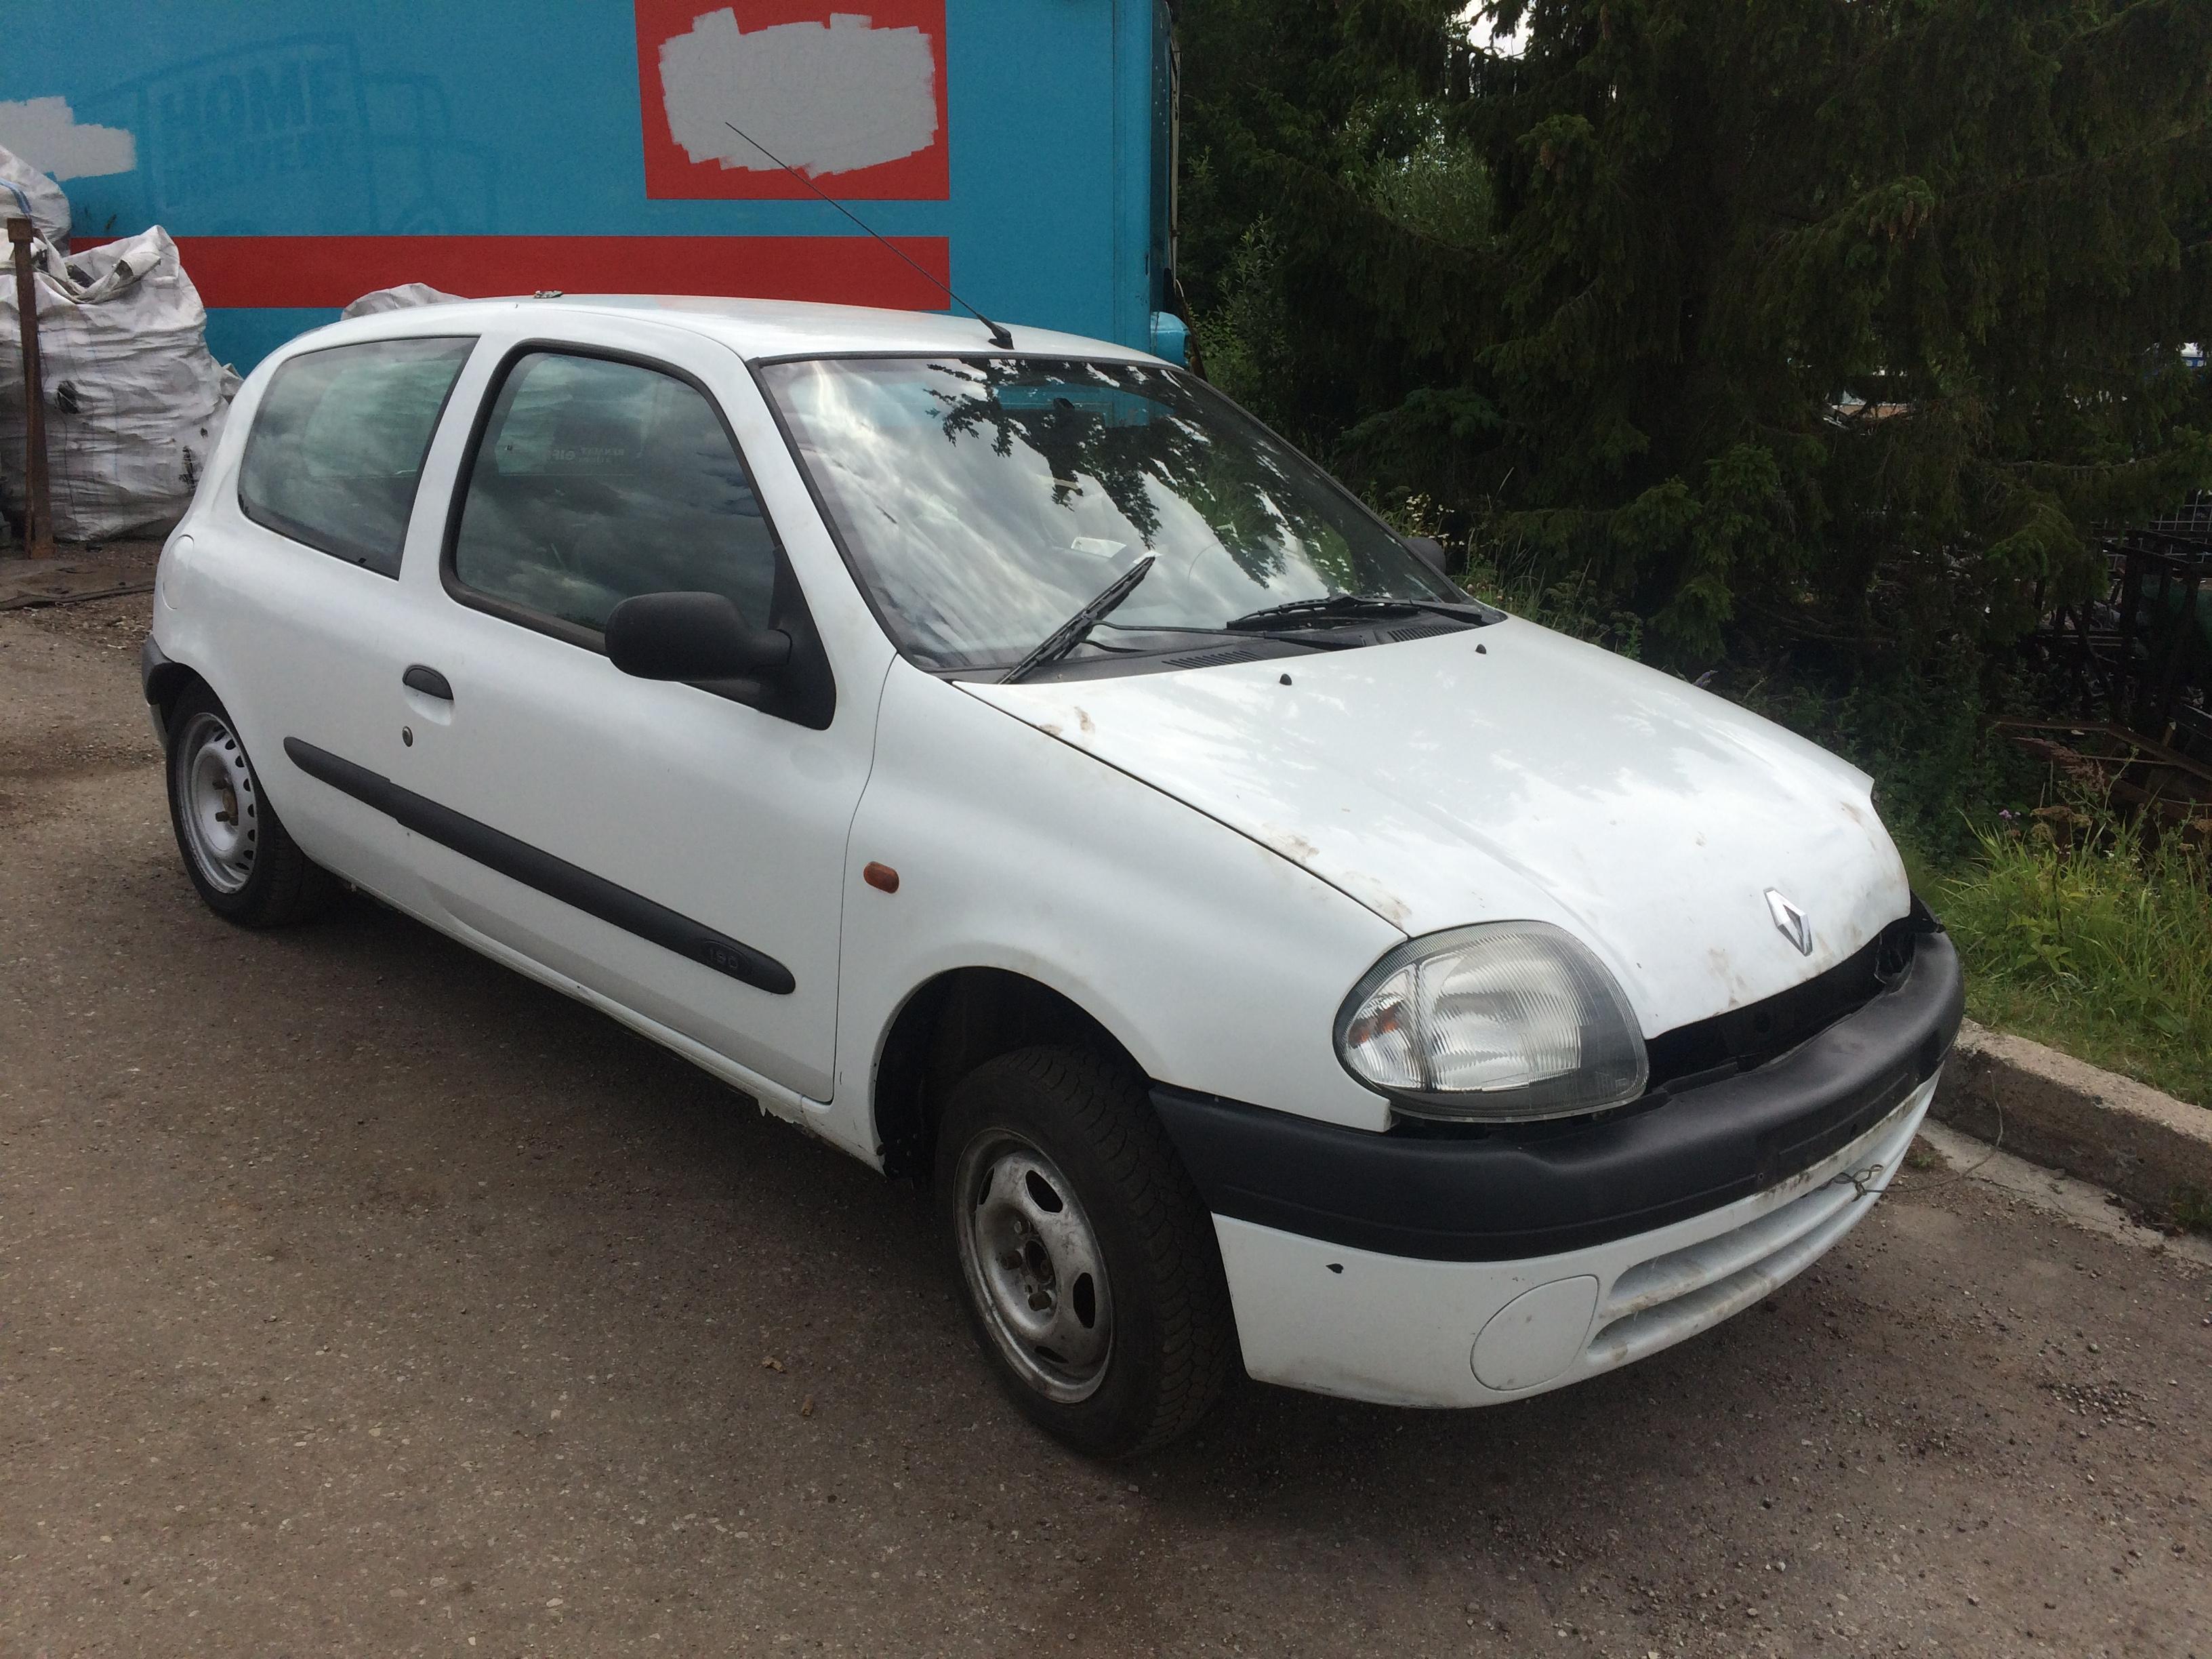 7700600251 7700600252 Oil Pump Renault Clio 2000 19l 25eur Silverado Center Console Wiring Harness 18kg